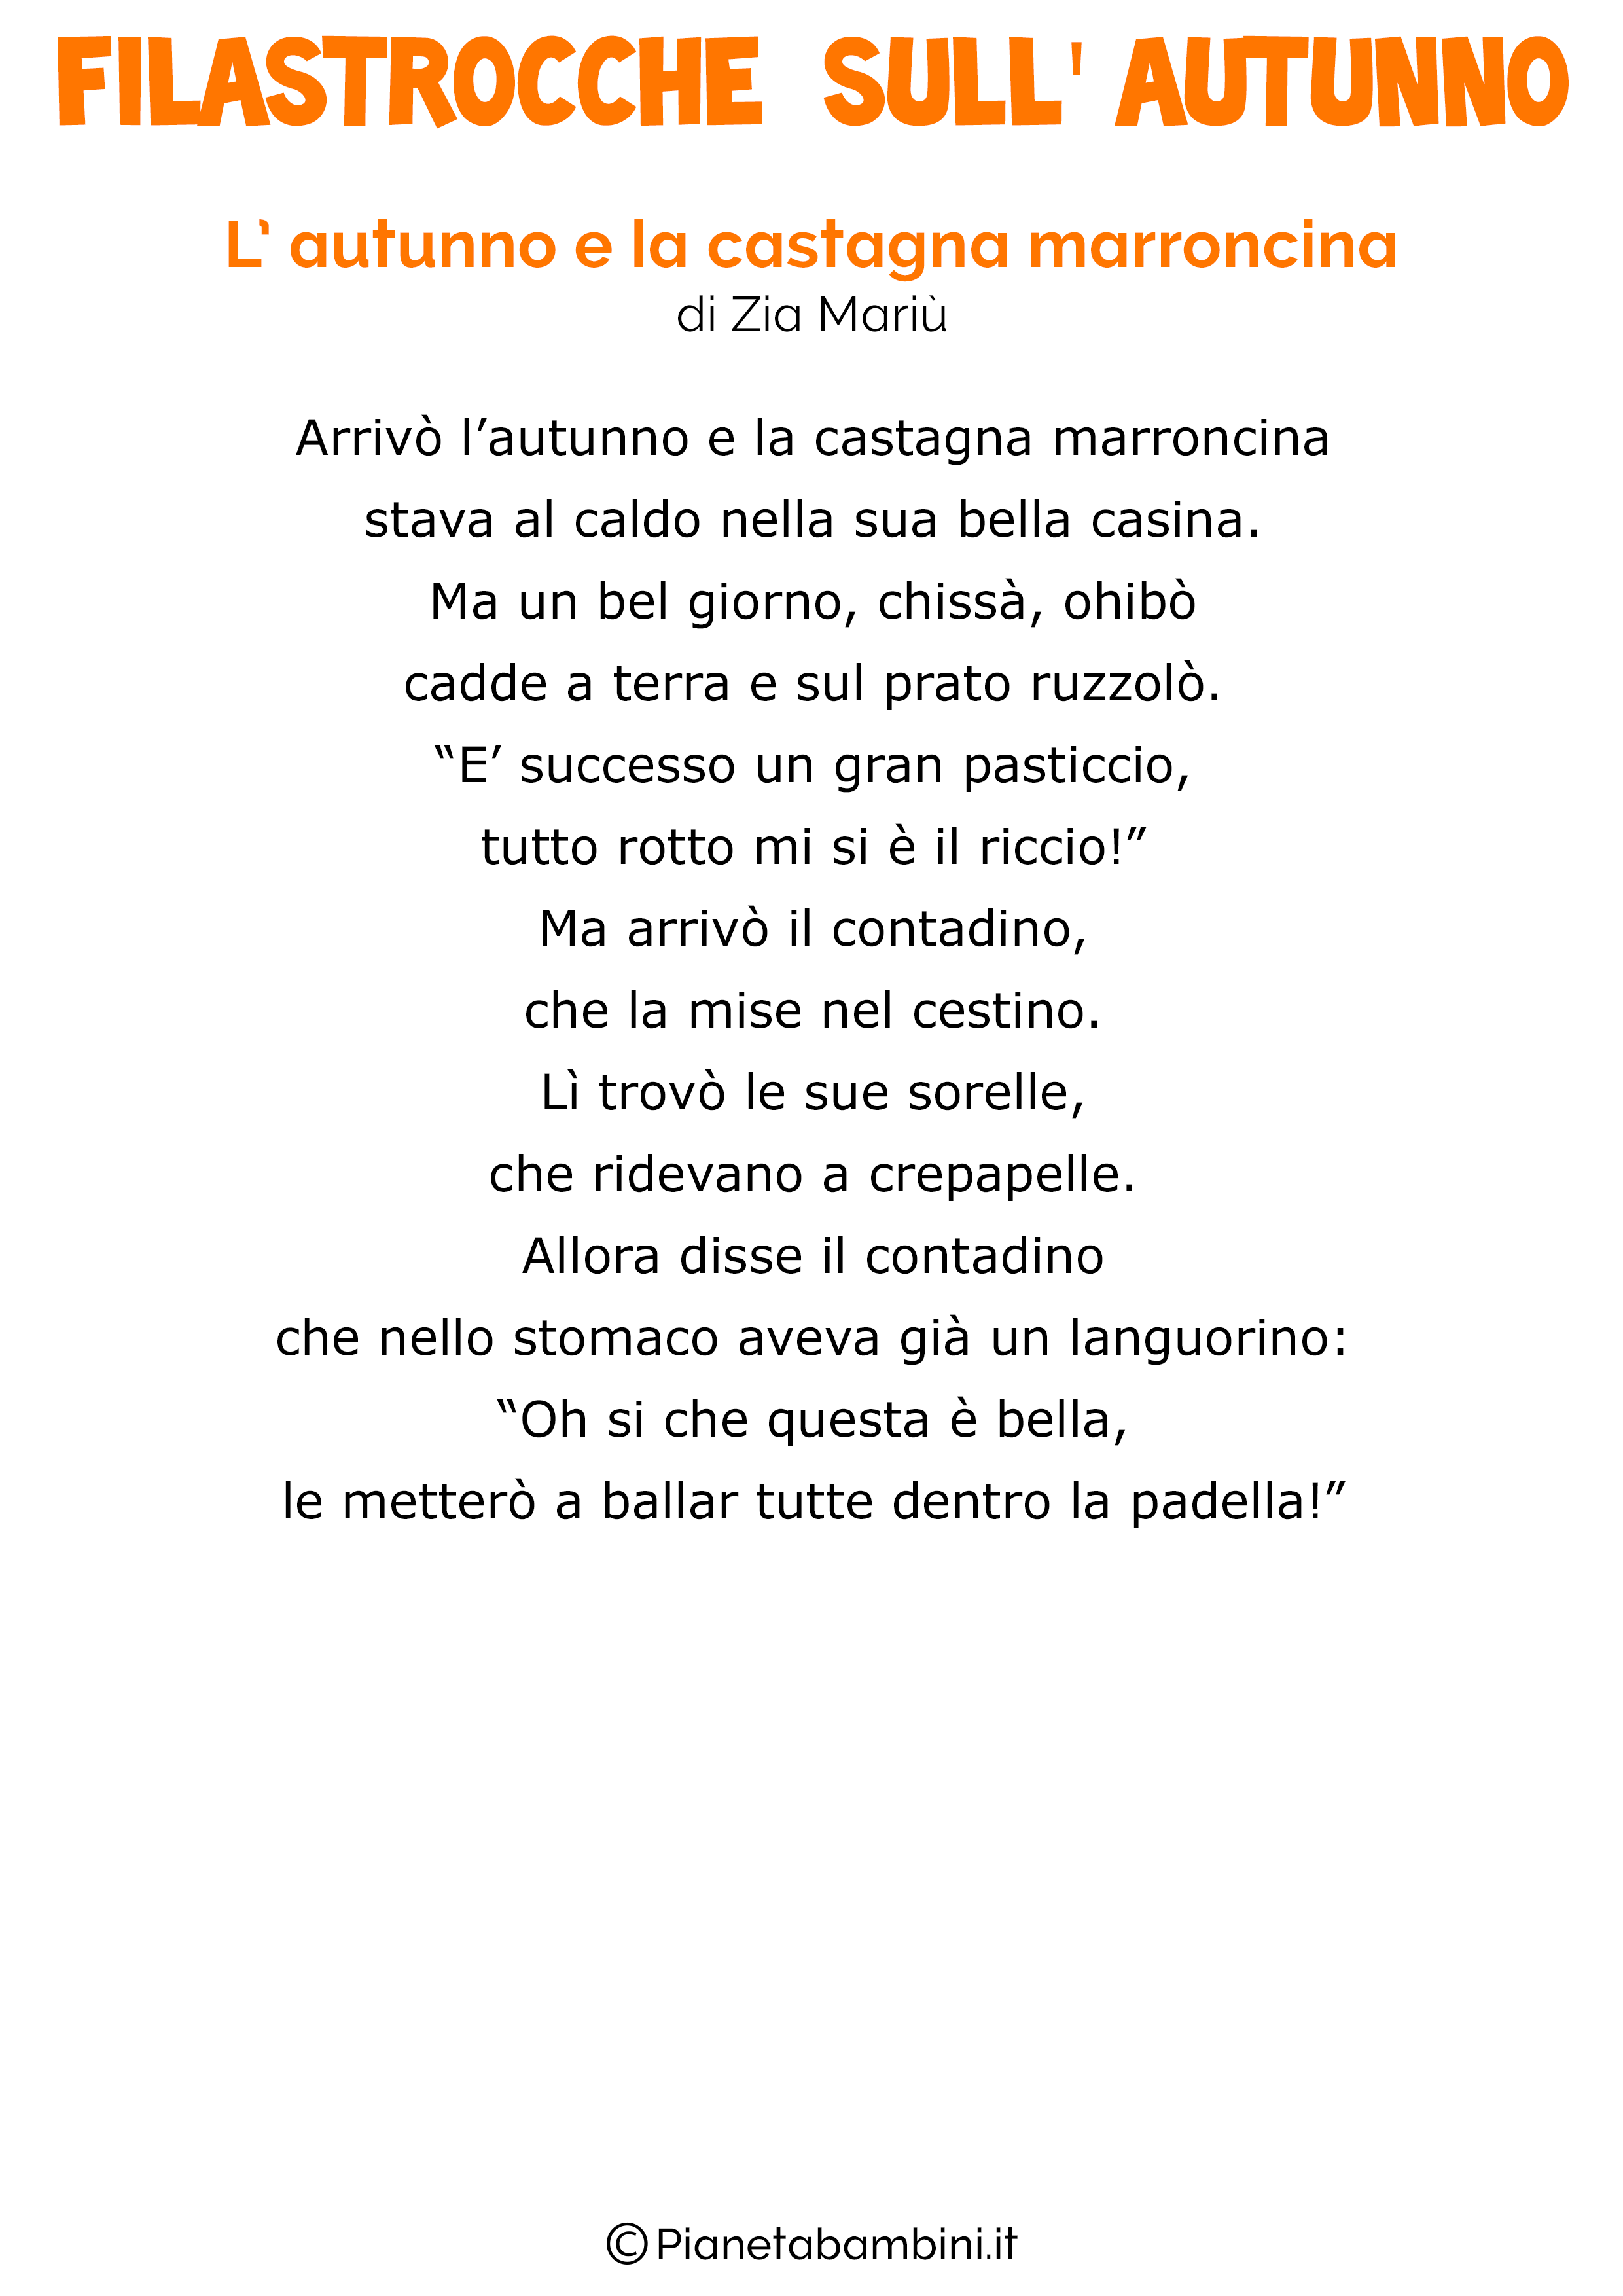 L-Autunno-e-la-Castagna-Marroncina-Zia-Mariu